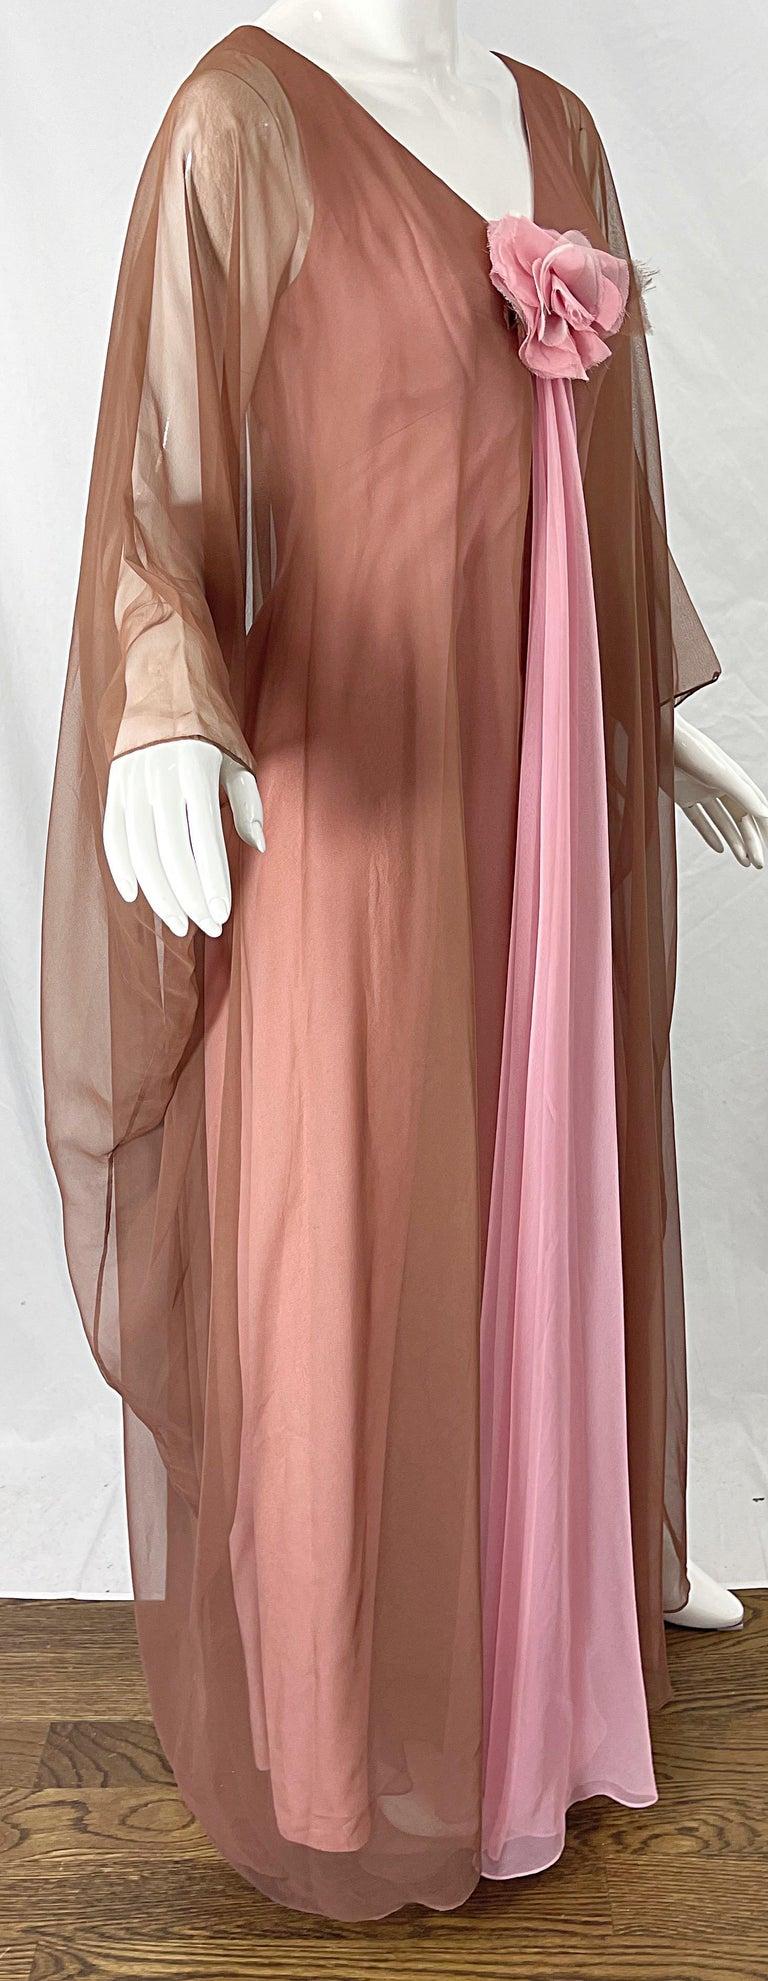 1970s Estevez Pink + Nude Brown Chiffon Caftan Vintage 70s Kaftan Maxi Dress For Sale 4